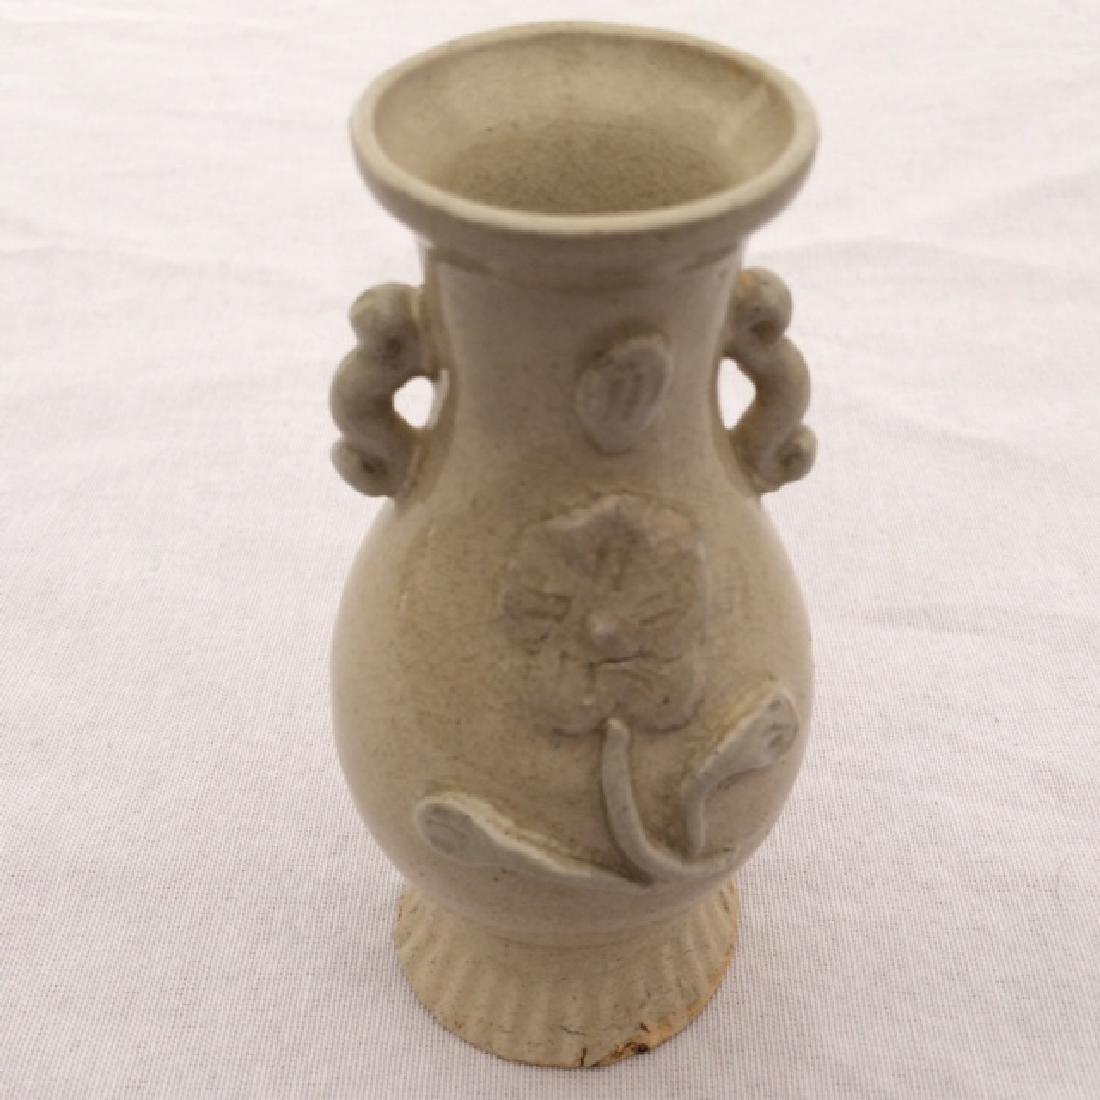 Chinese Antique Style Porcelain 2 Ear Rose Design Vase